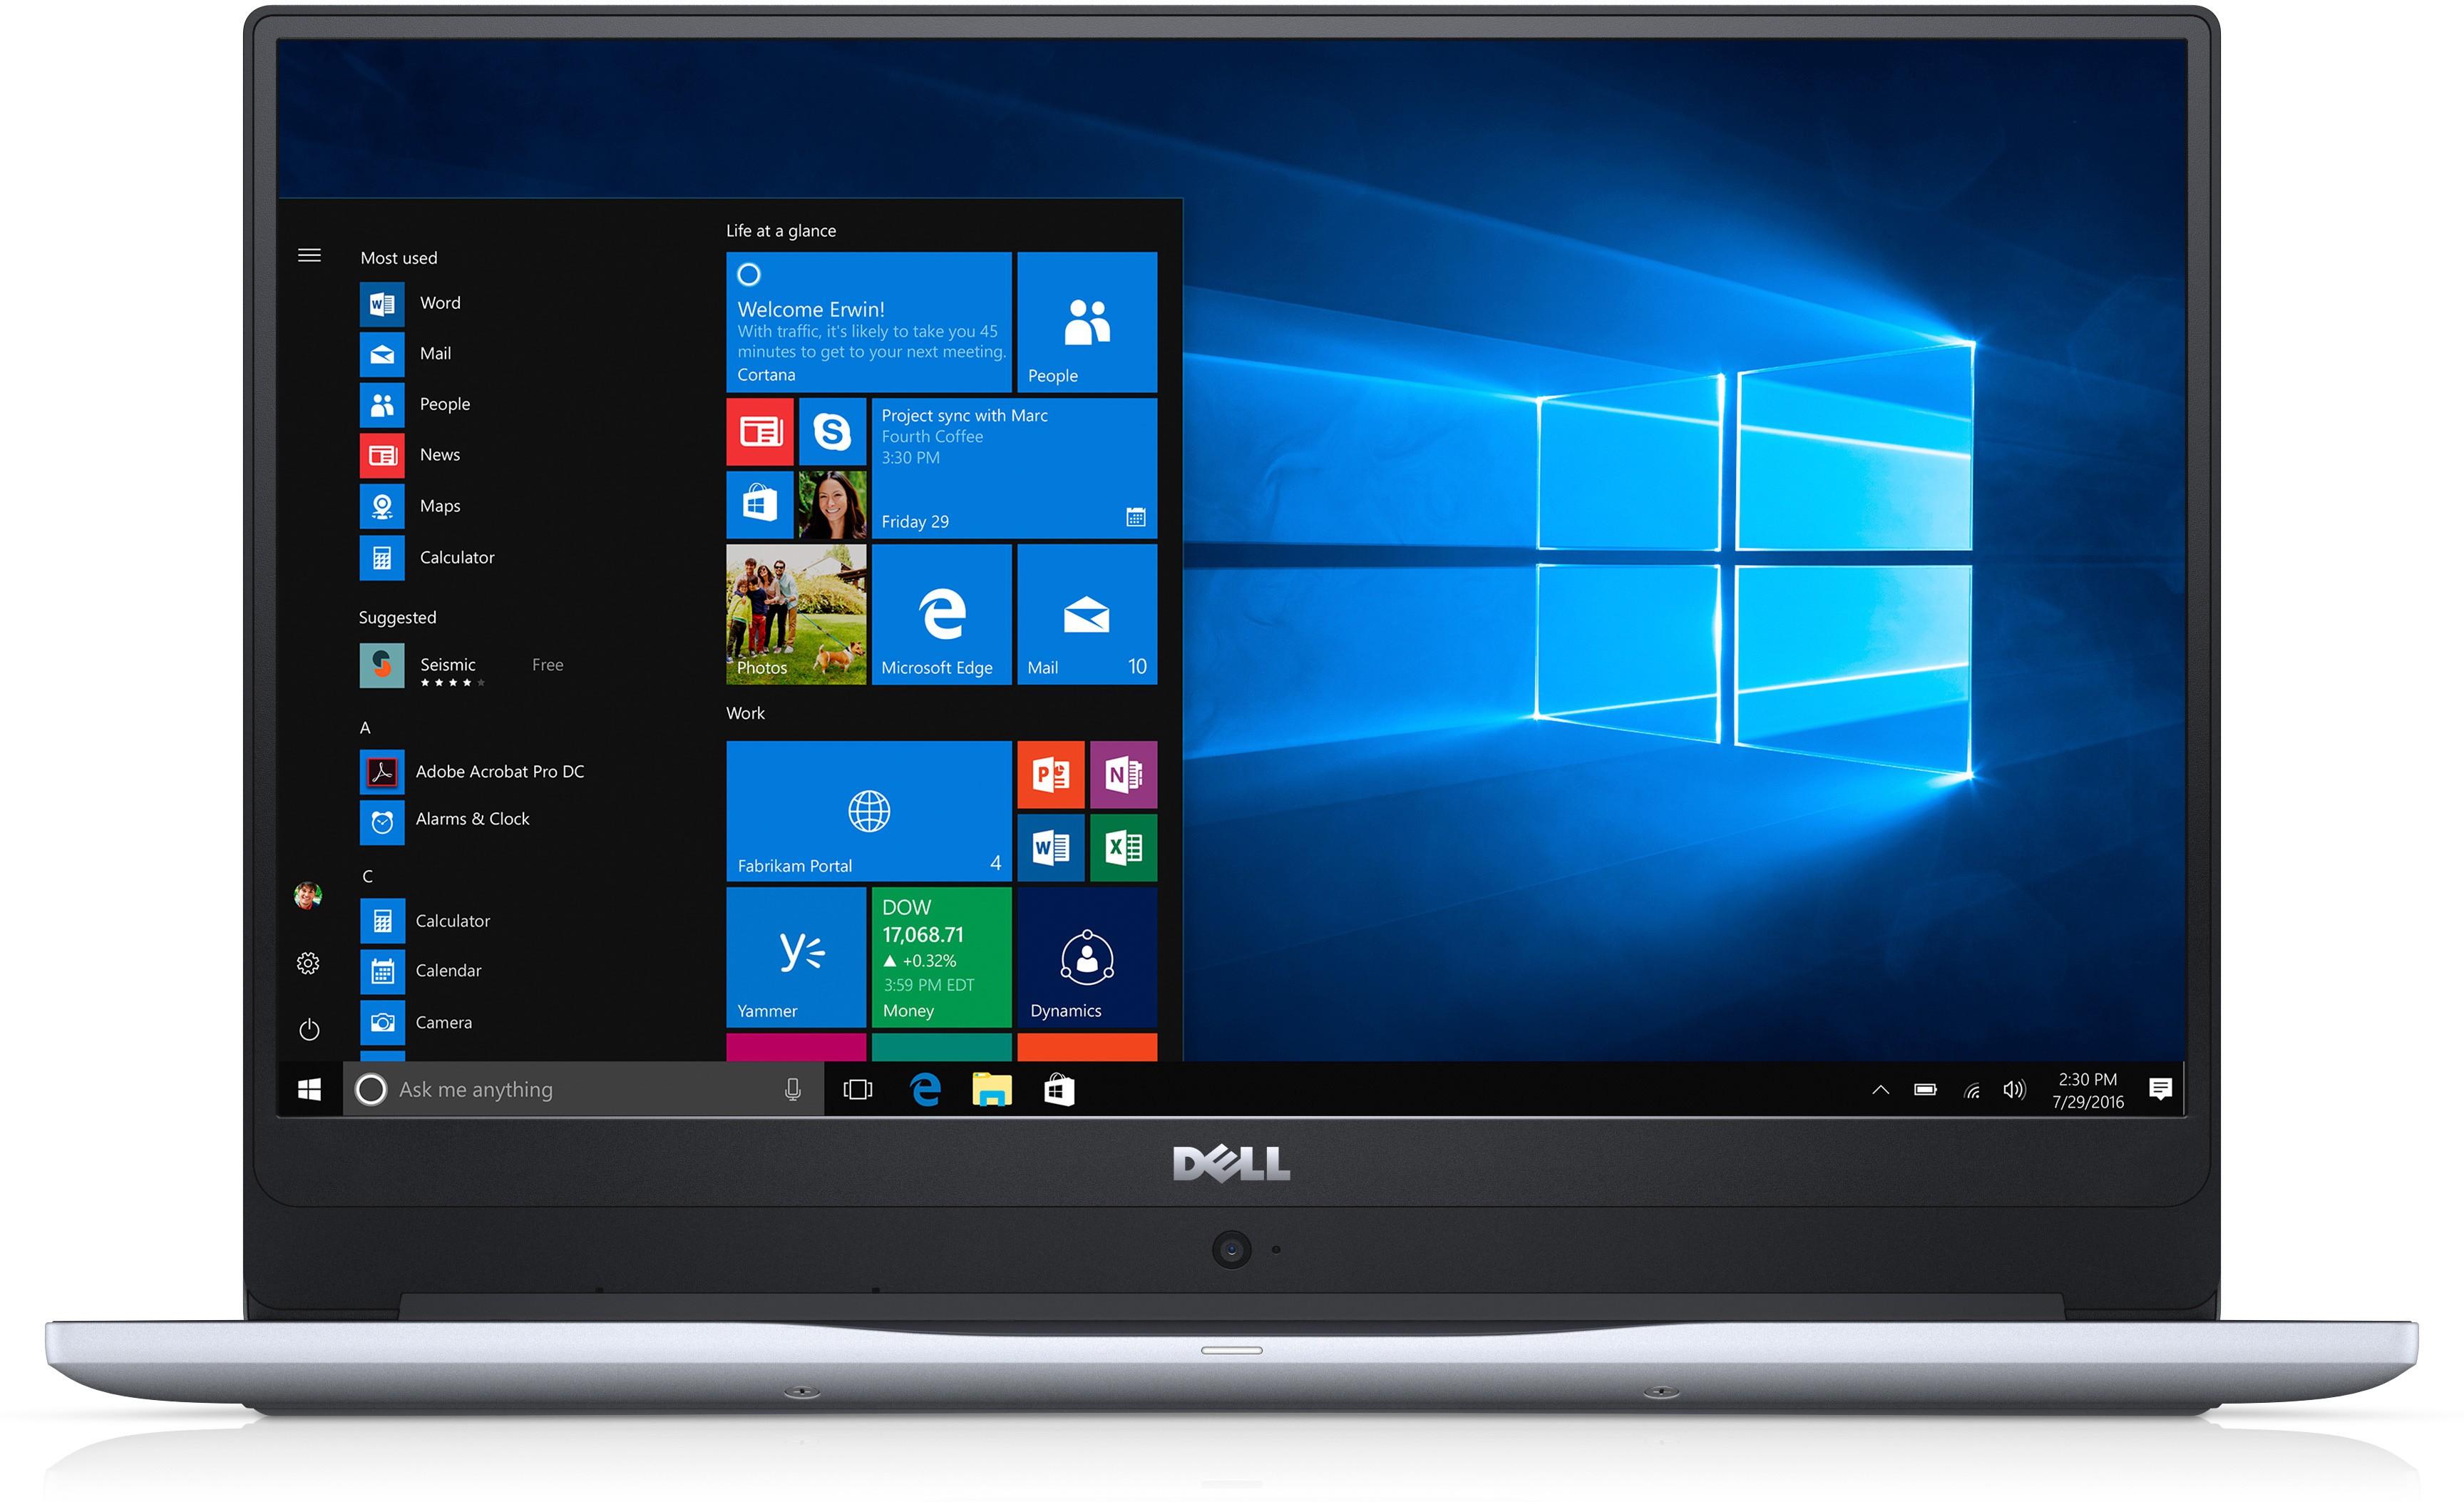 Dell Inspiron 7000 Core i7 7th Gen - (8 GB/1 TB HDD/128 GB SSD/Windows 10 Home/4 GB Graphics) 7560 Notebook(15.6 inch, Gray)   Laptop  (Dell)